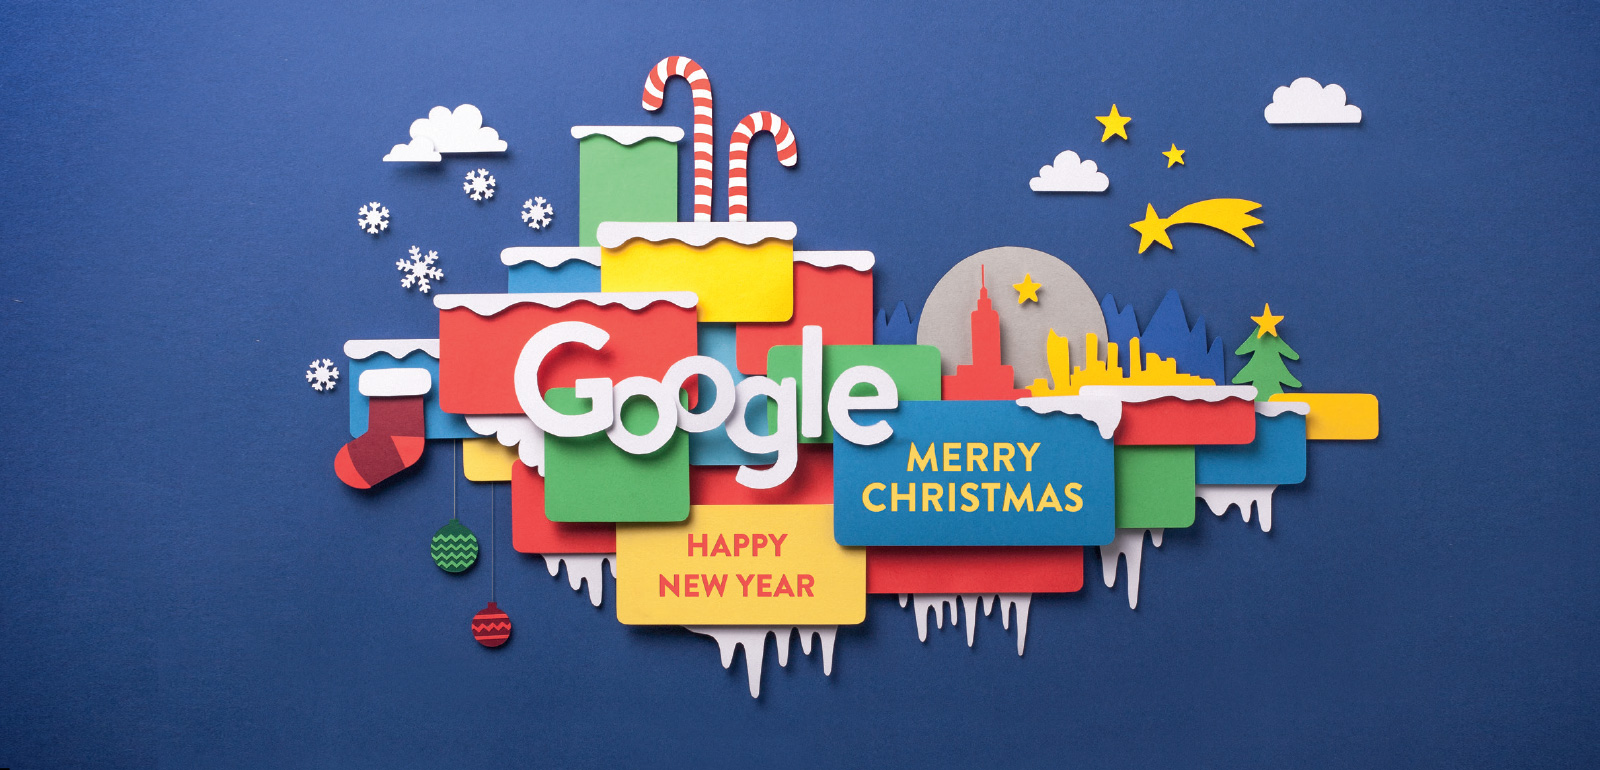 google poland christmas card dedadi